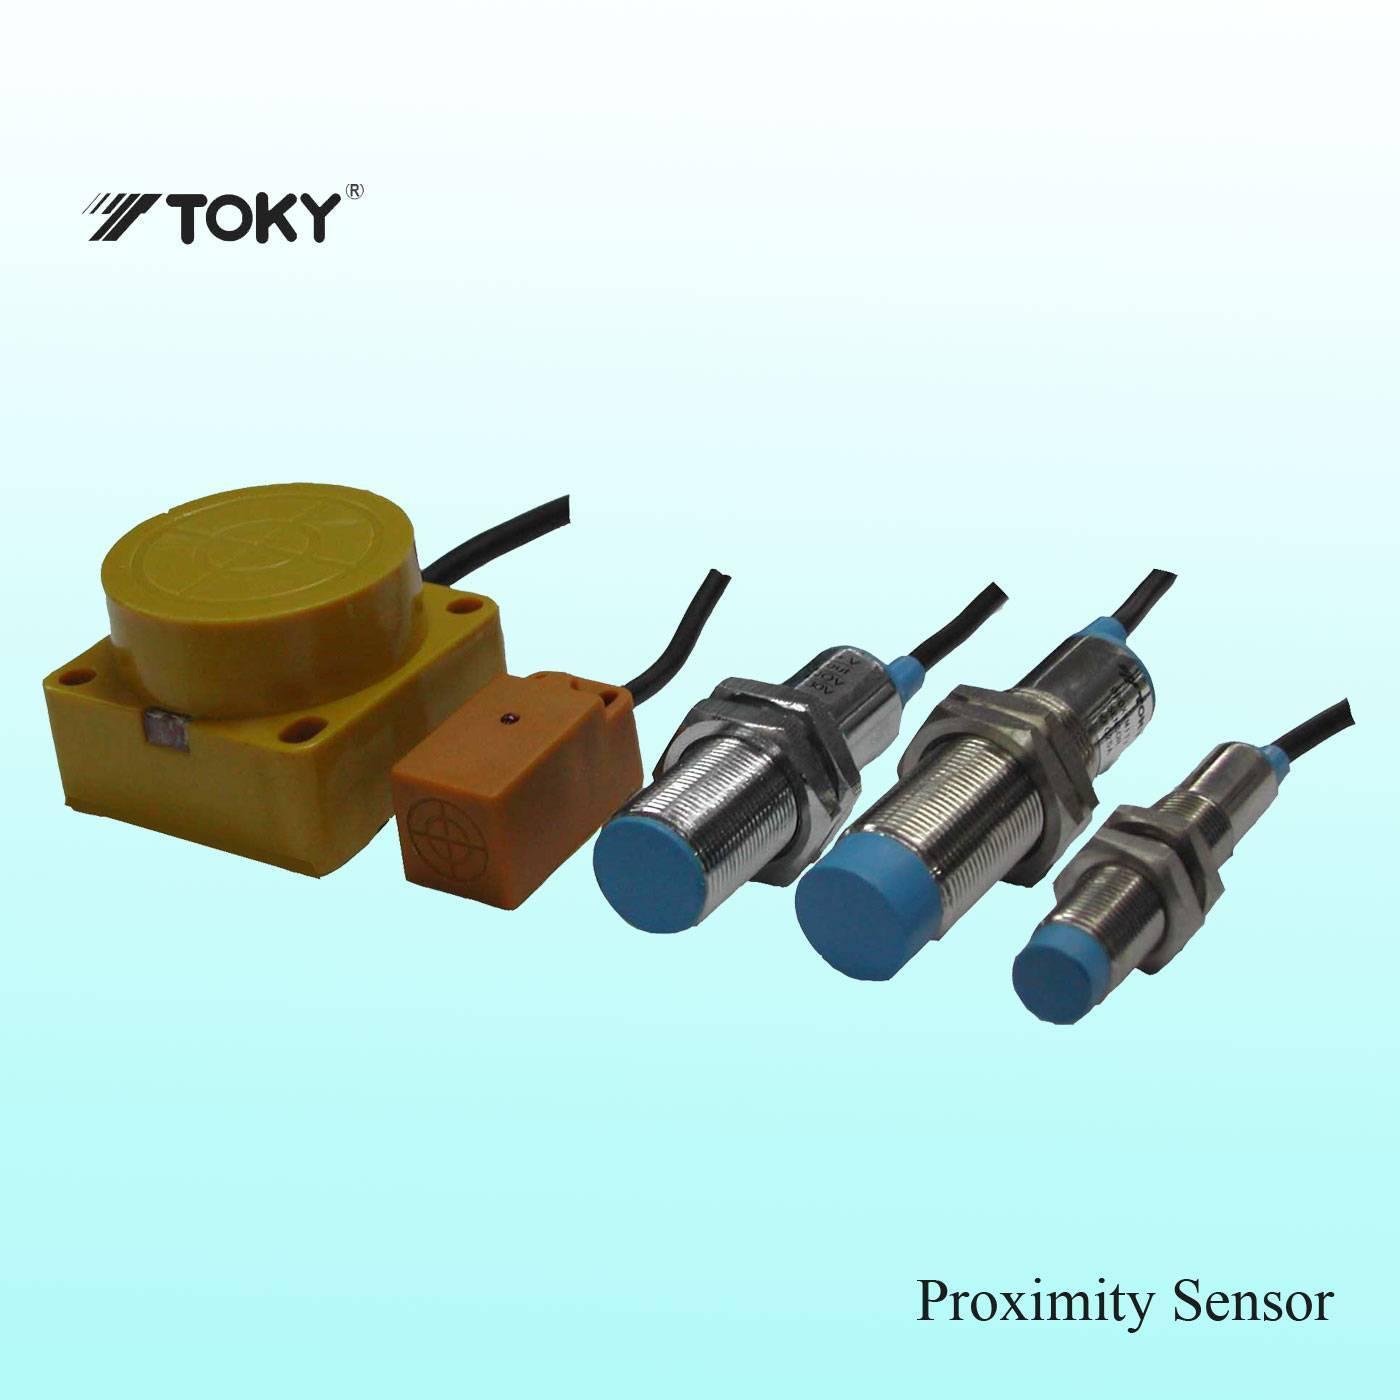 Proximity Sensor - TOKY ELECTRICAL CO,. LTD